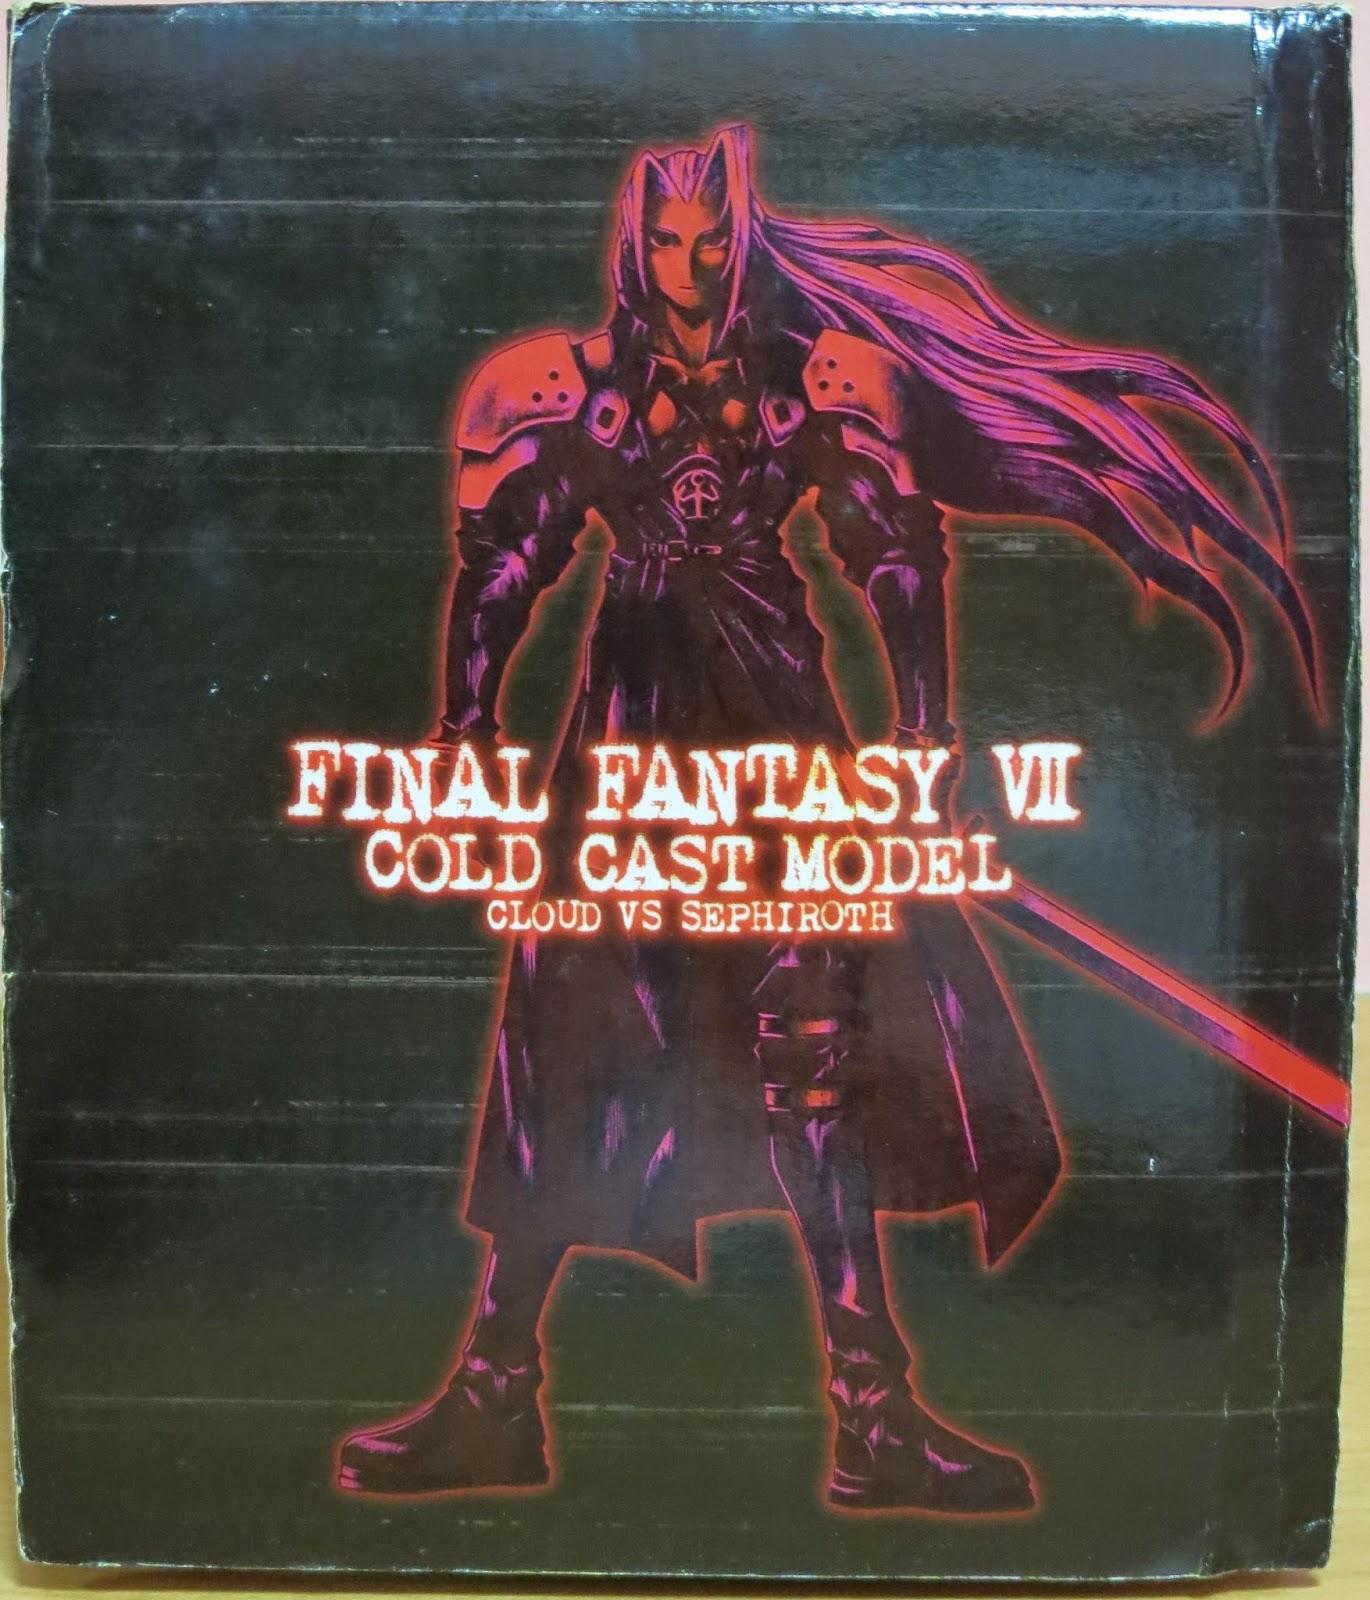 darkrose of sorrow Final Fantasy VII Cold Cast Model Cloud vs